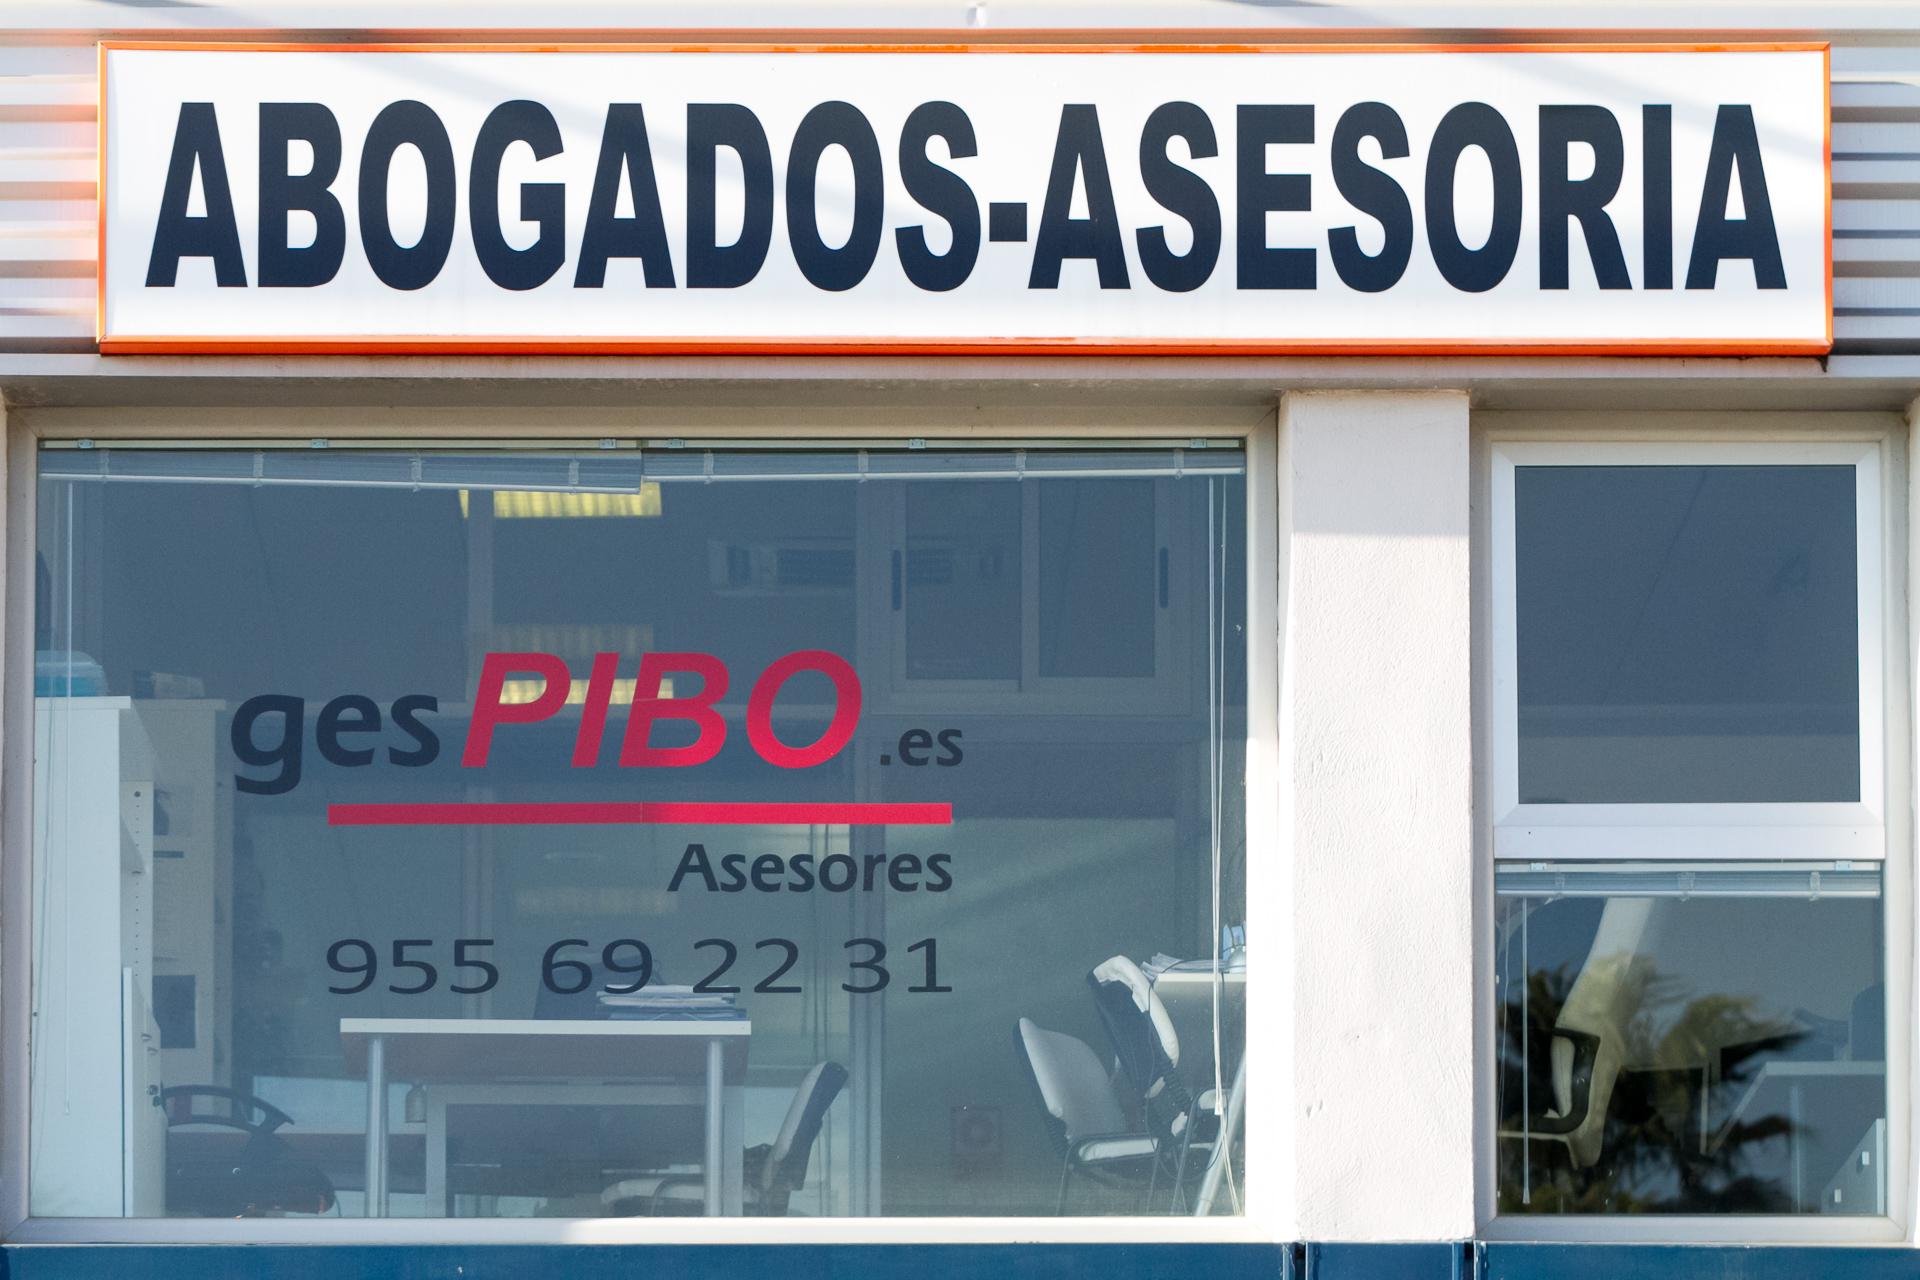 GesPIBO Avda. Espartinas 21-25 Local 45 41110 Bollullos de la Mitación, Sevilla